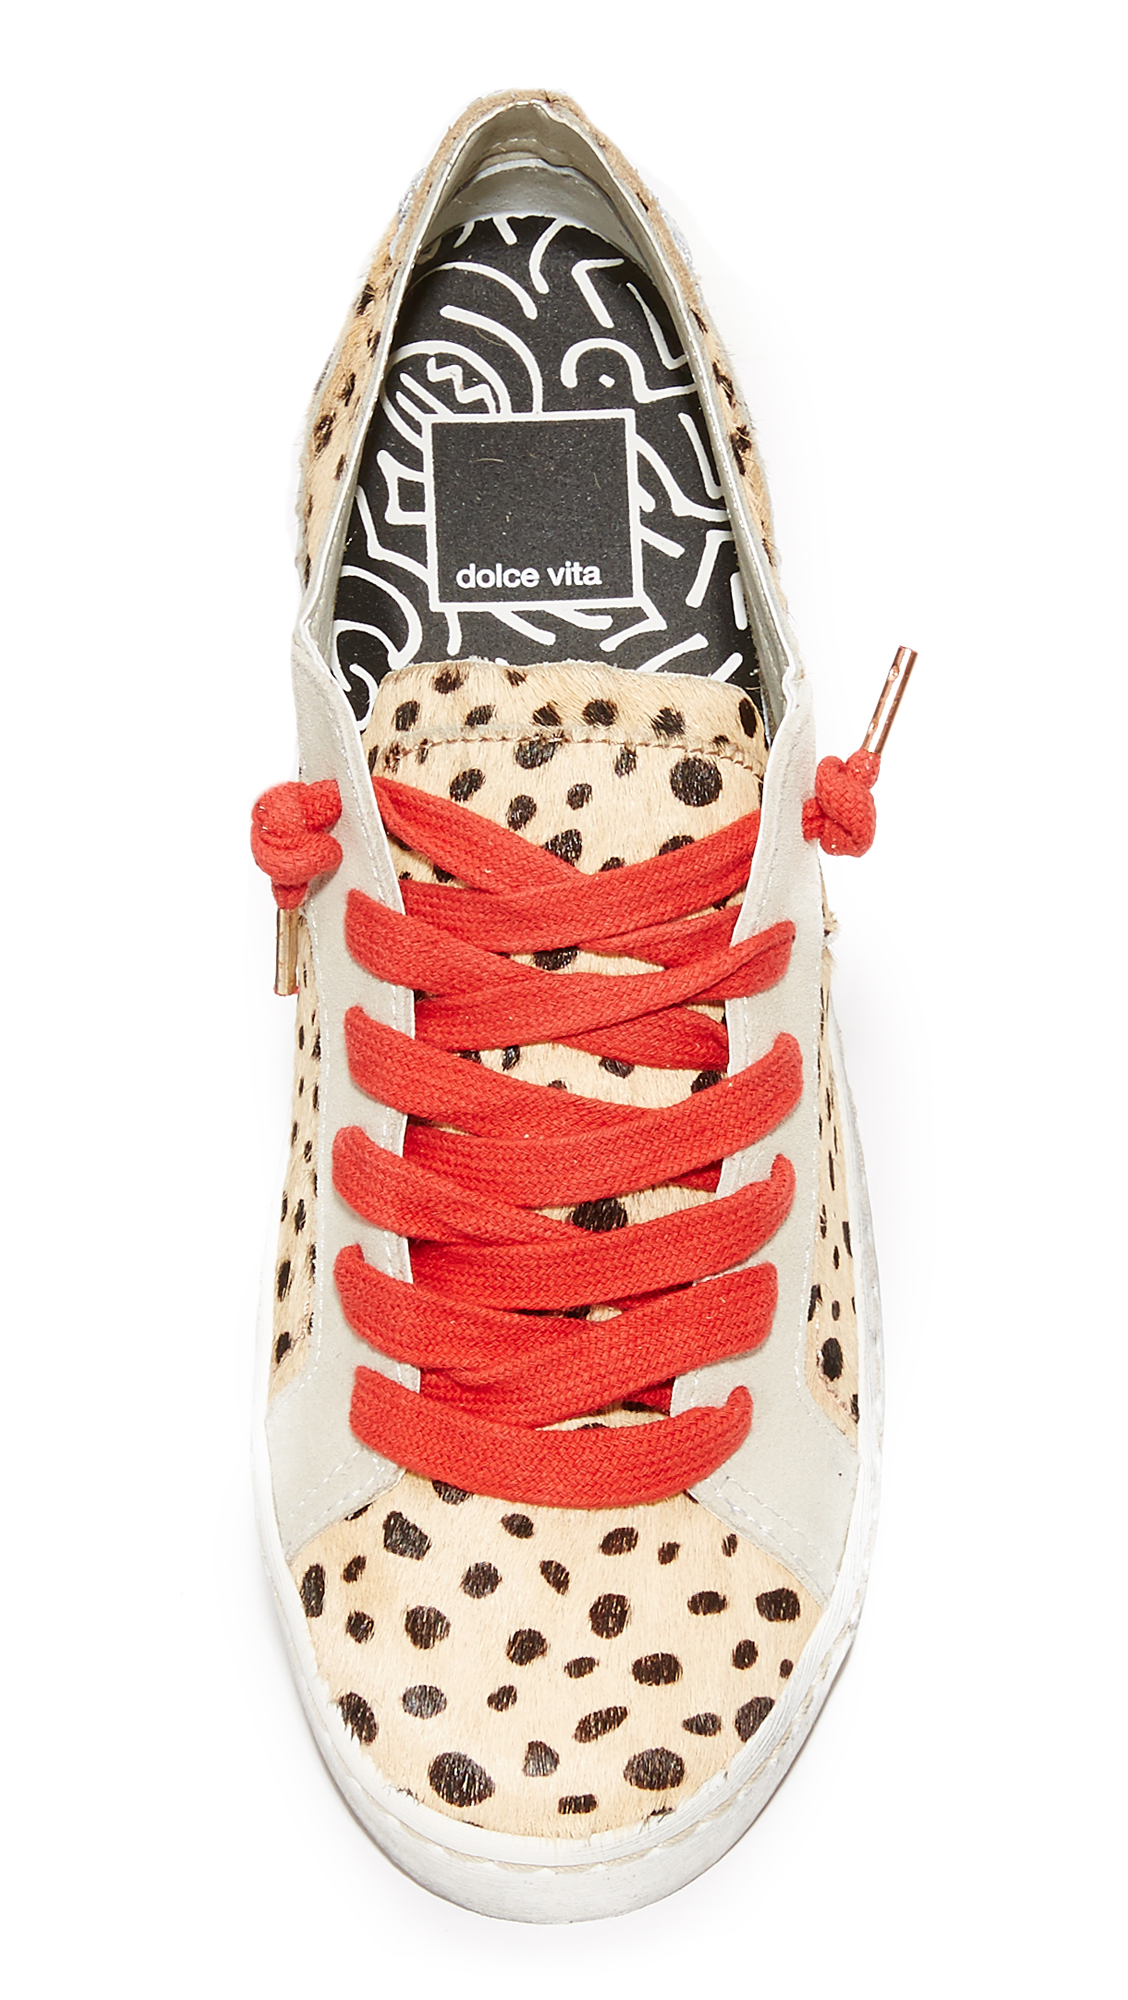 986659dee40f Dolce Vita Zalen Haircalf Sneakers | SHOPBOP